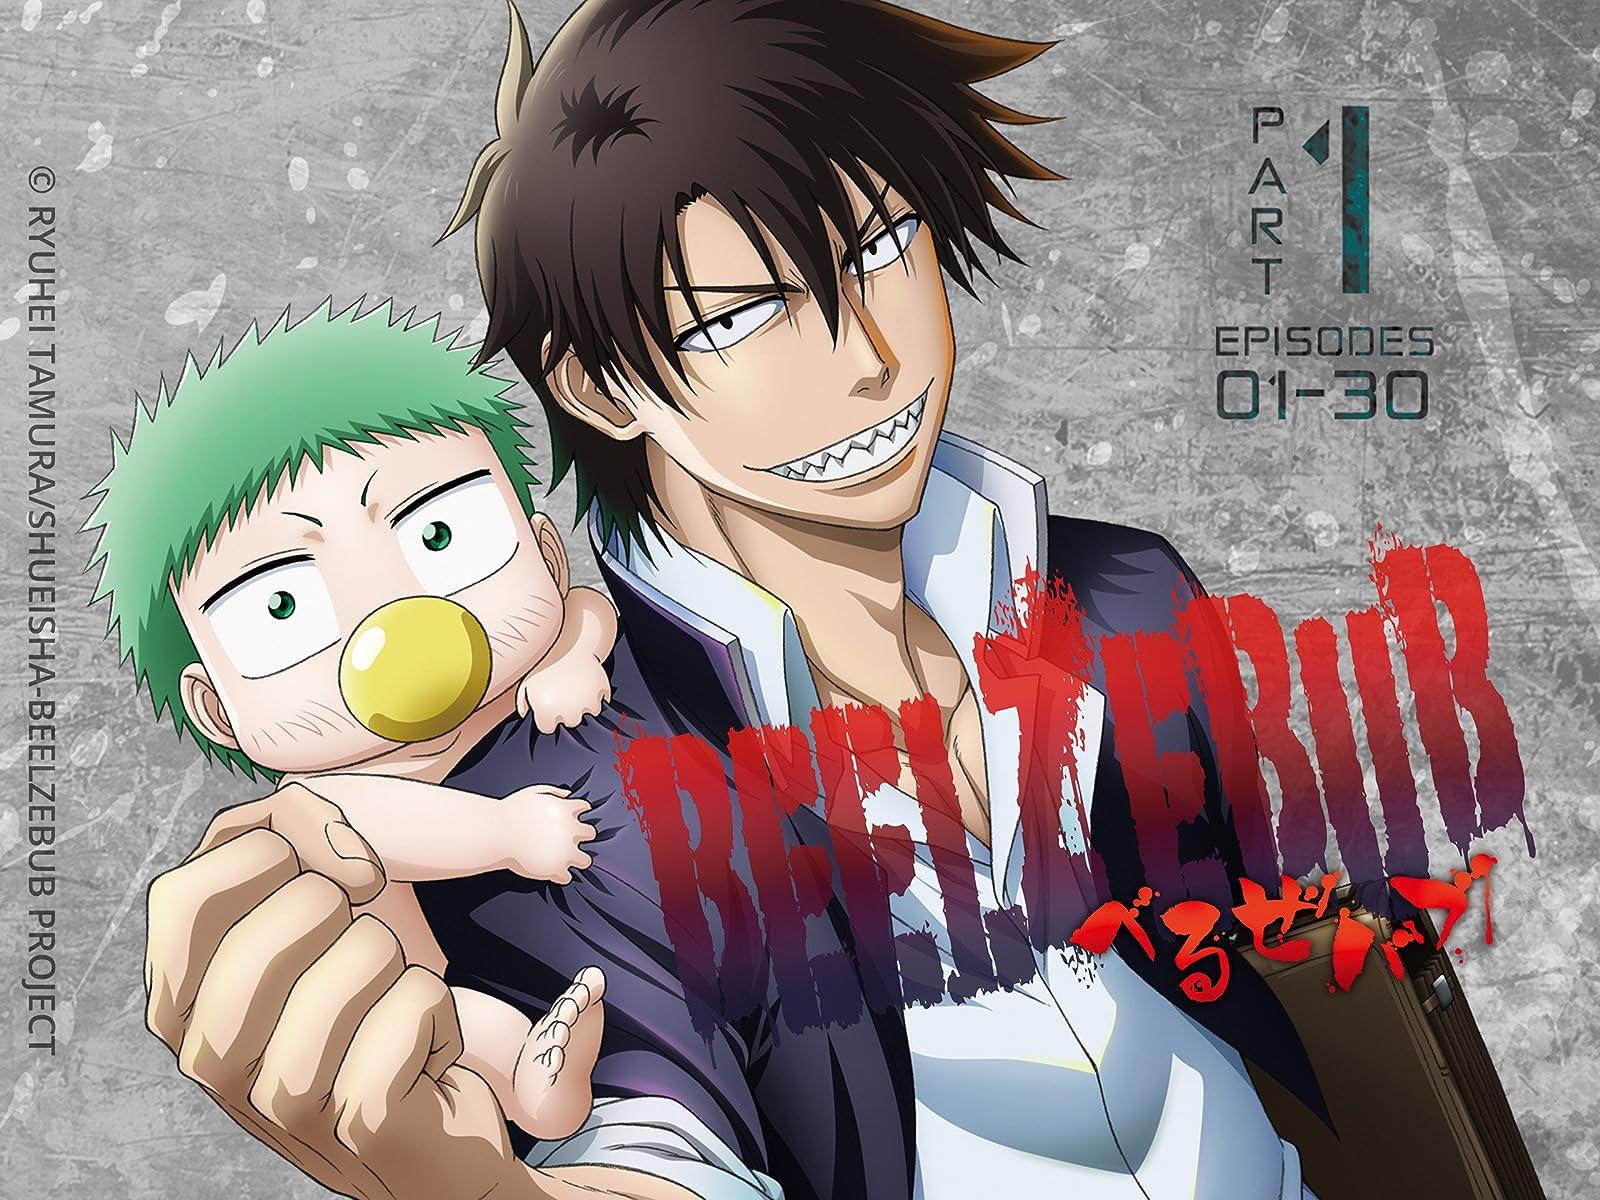 English season dub episode 1 a ryuanime 2 live Ryuanime Dubbed